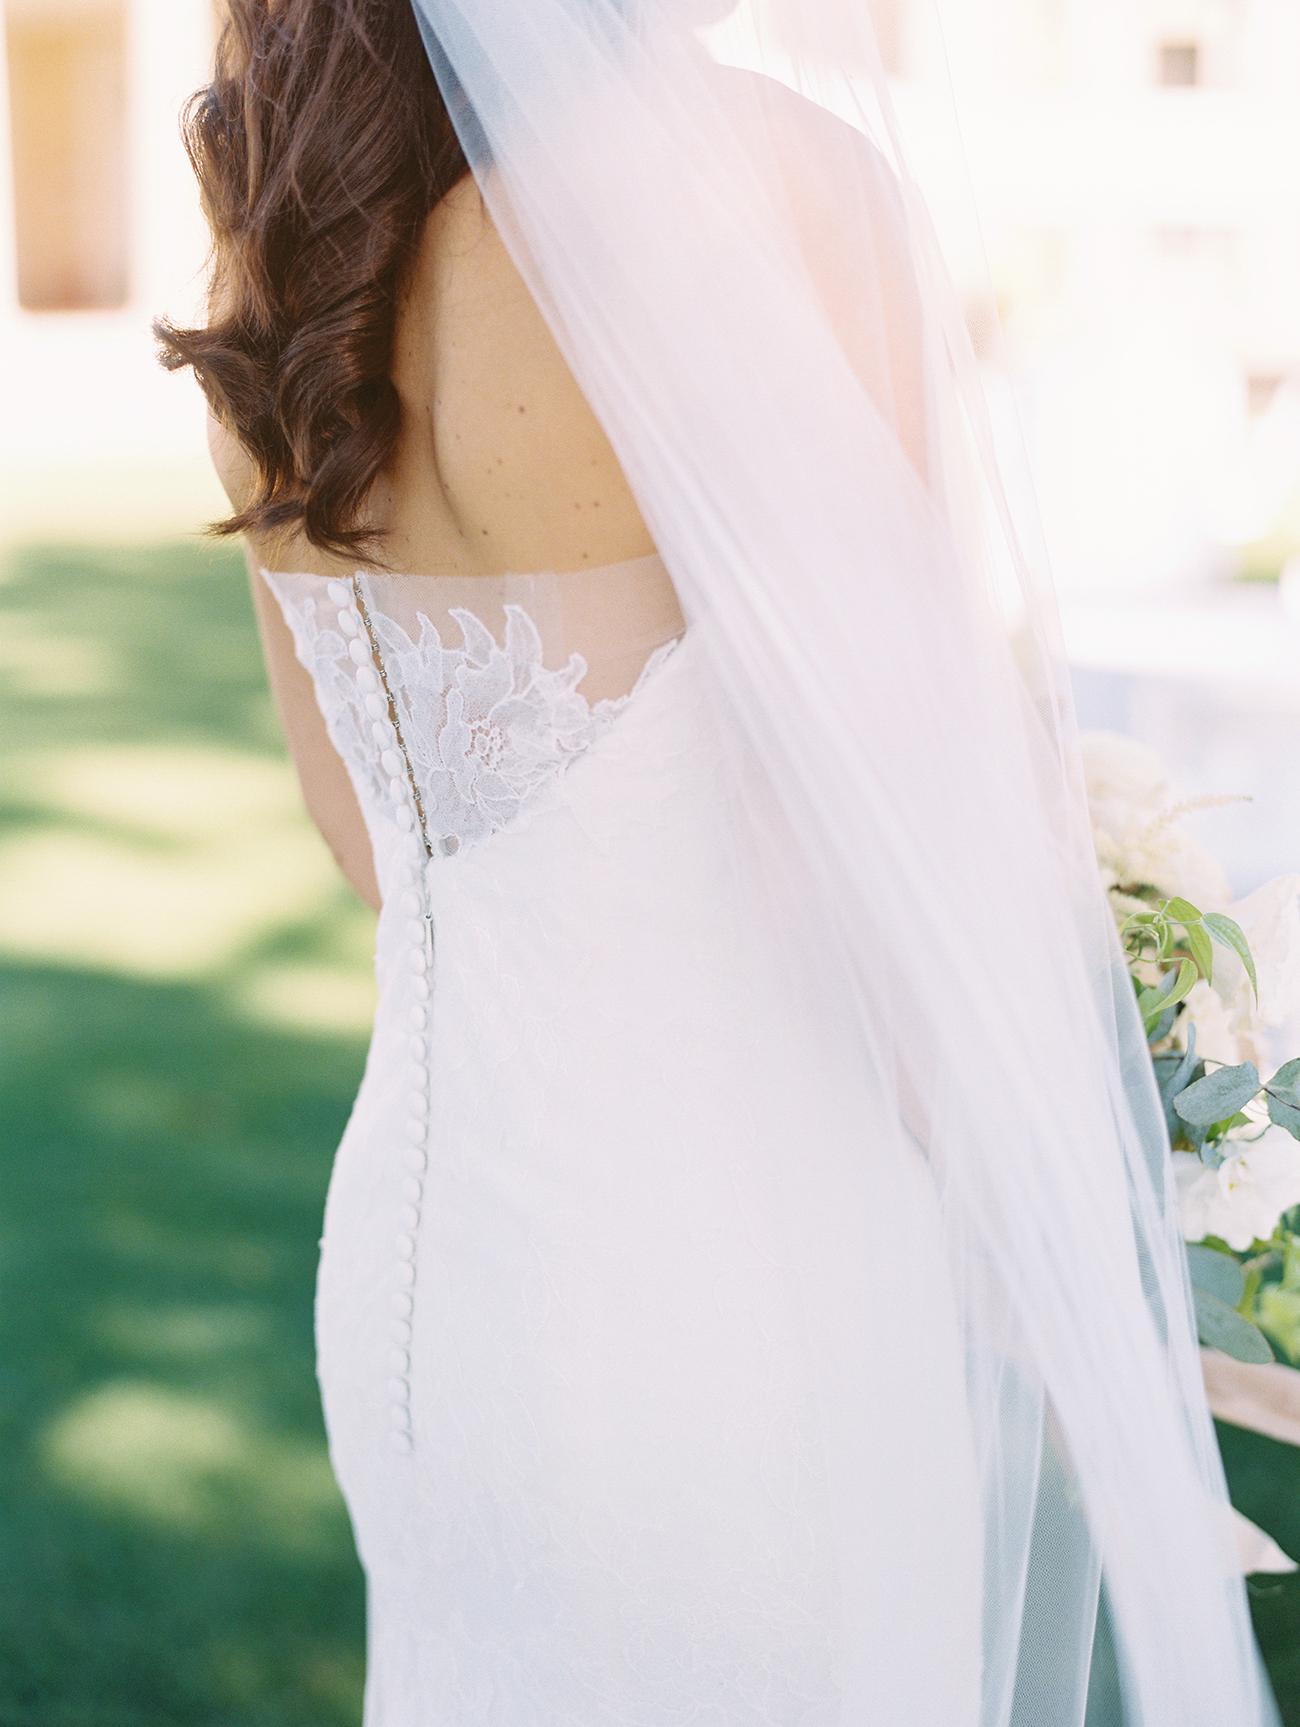 The Most Common Wedding Dress Embellishments, Explained